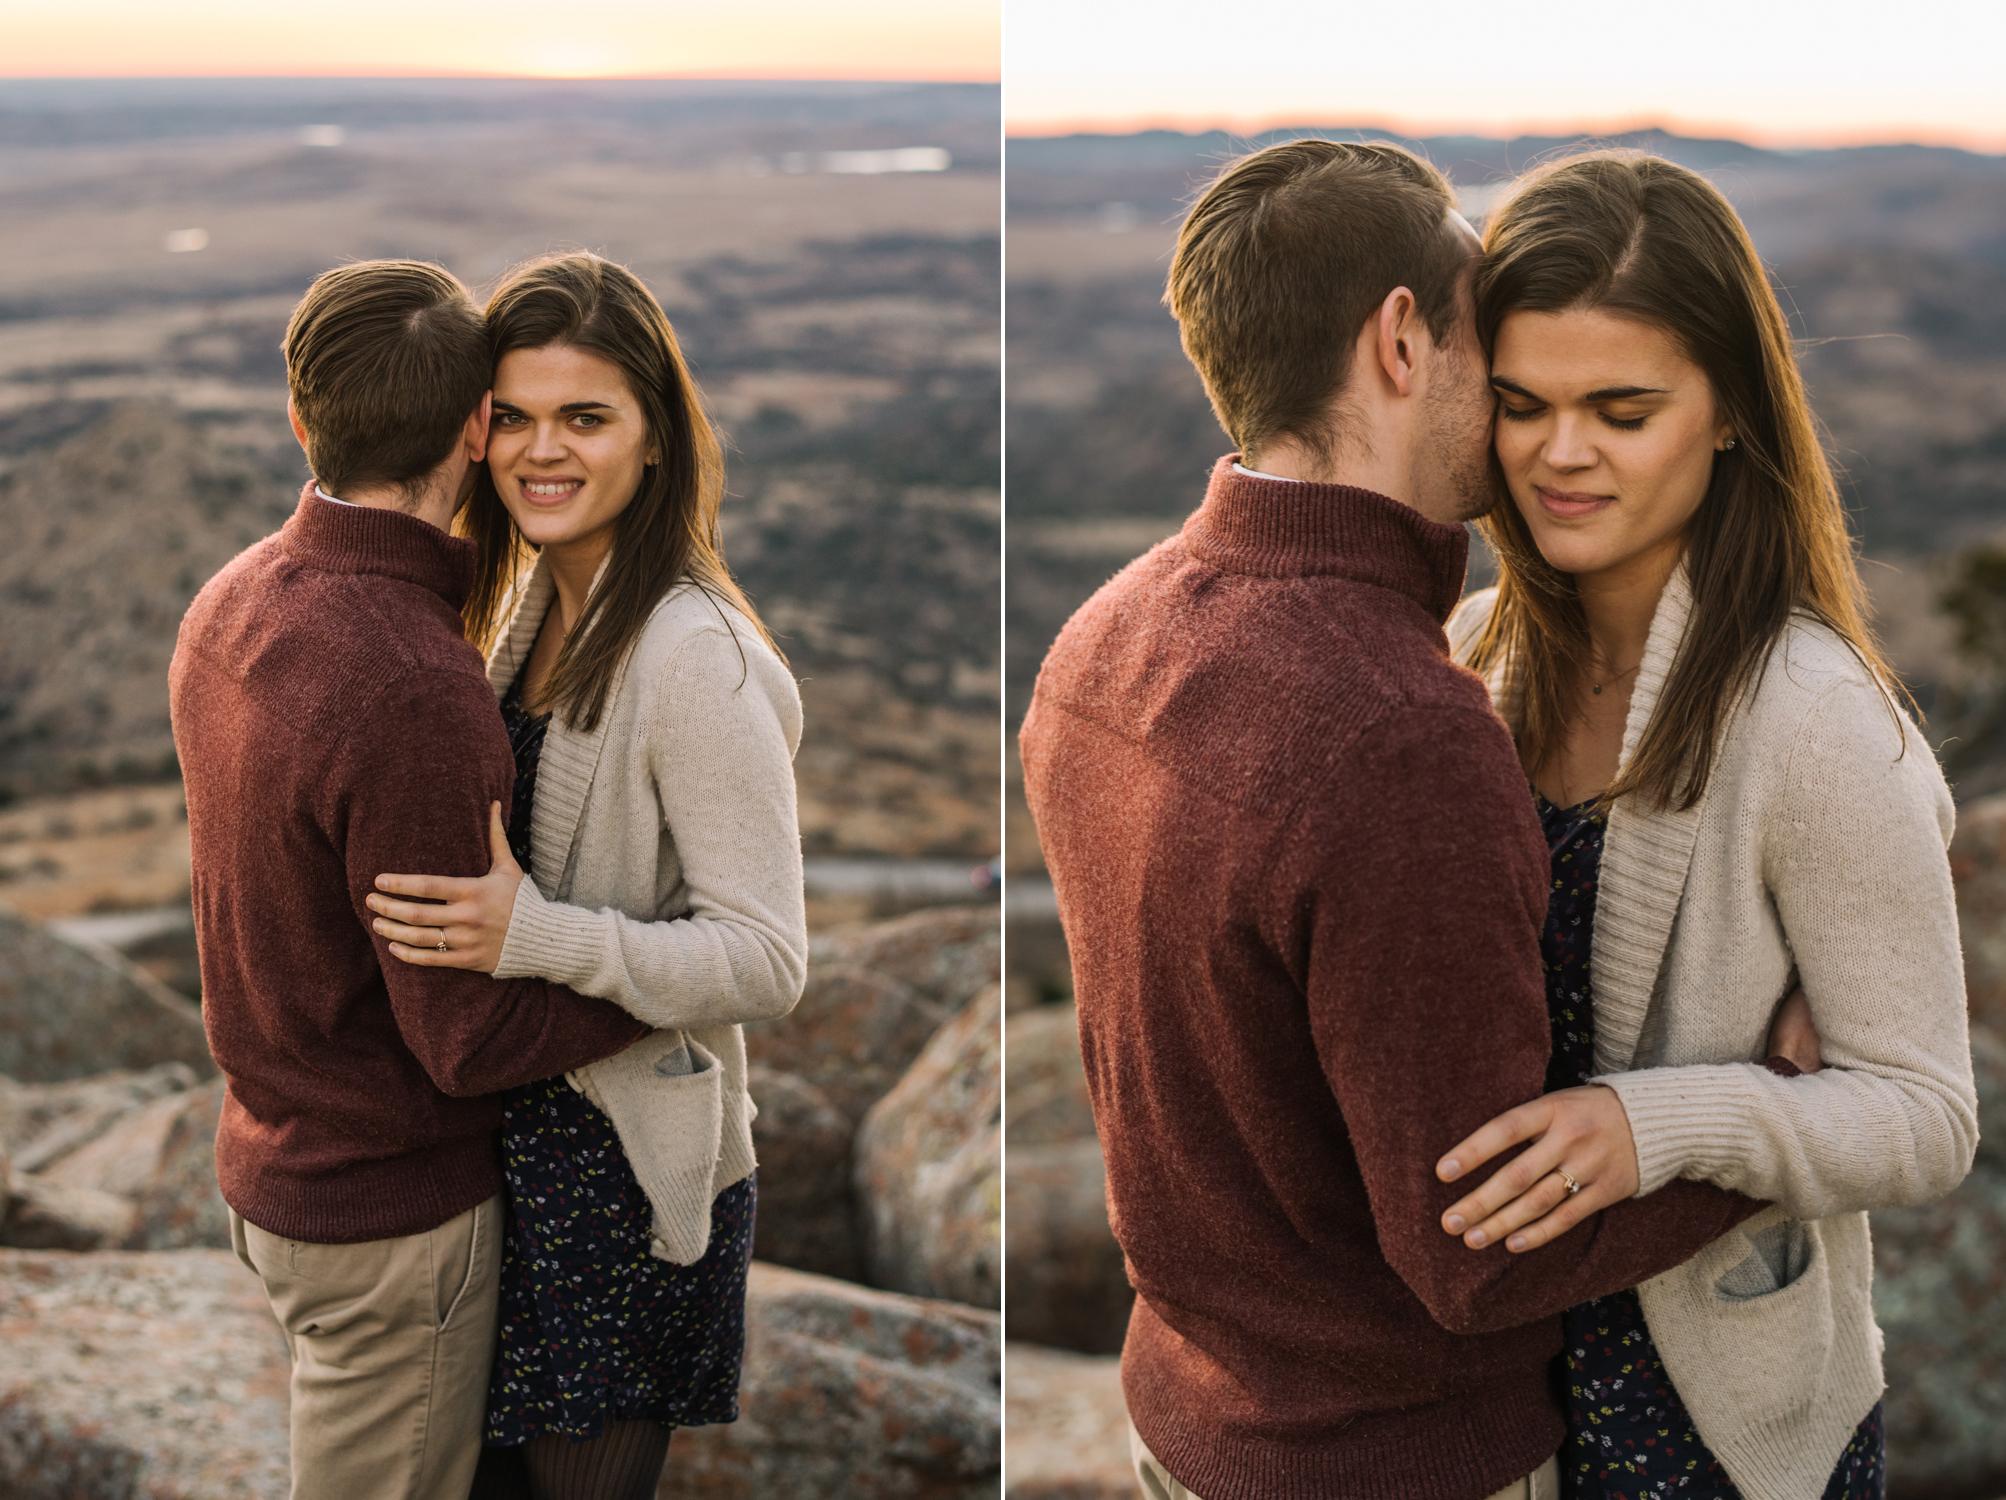 Wichita Kansas Engagement Photographer-Oklahoma Photographer-Wichita Mountains-Neal Dieker-143.jpg